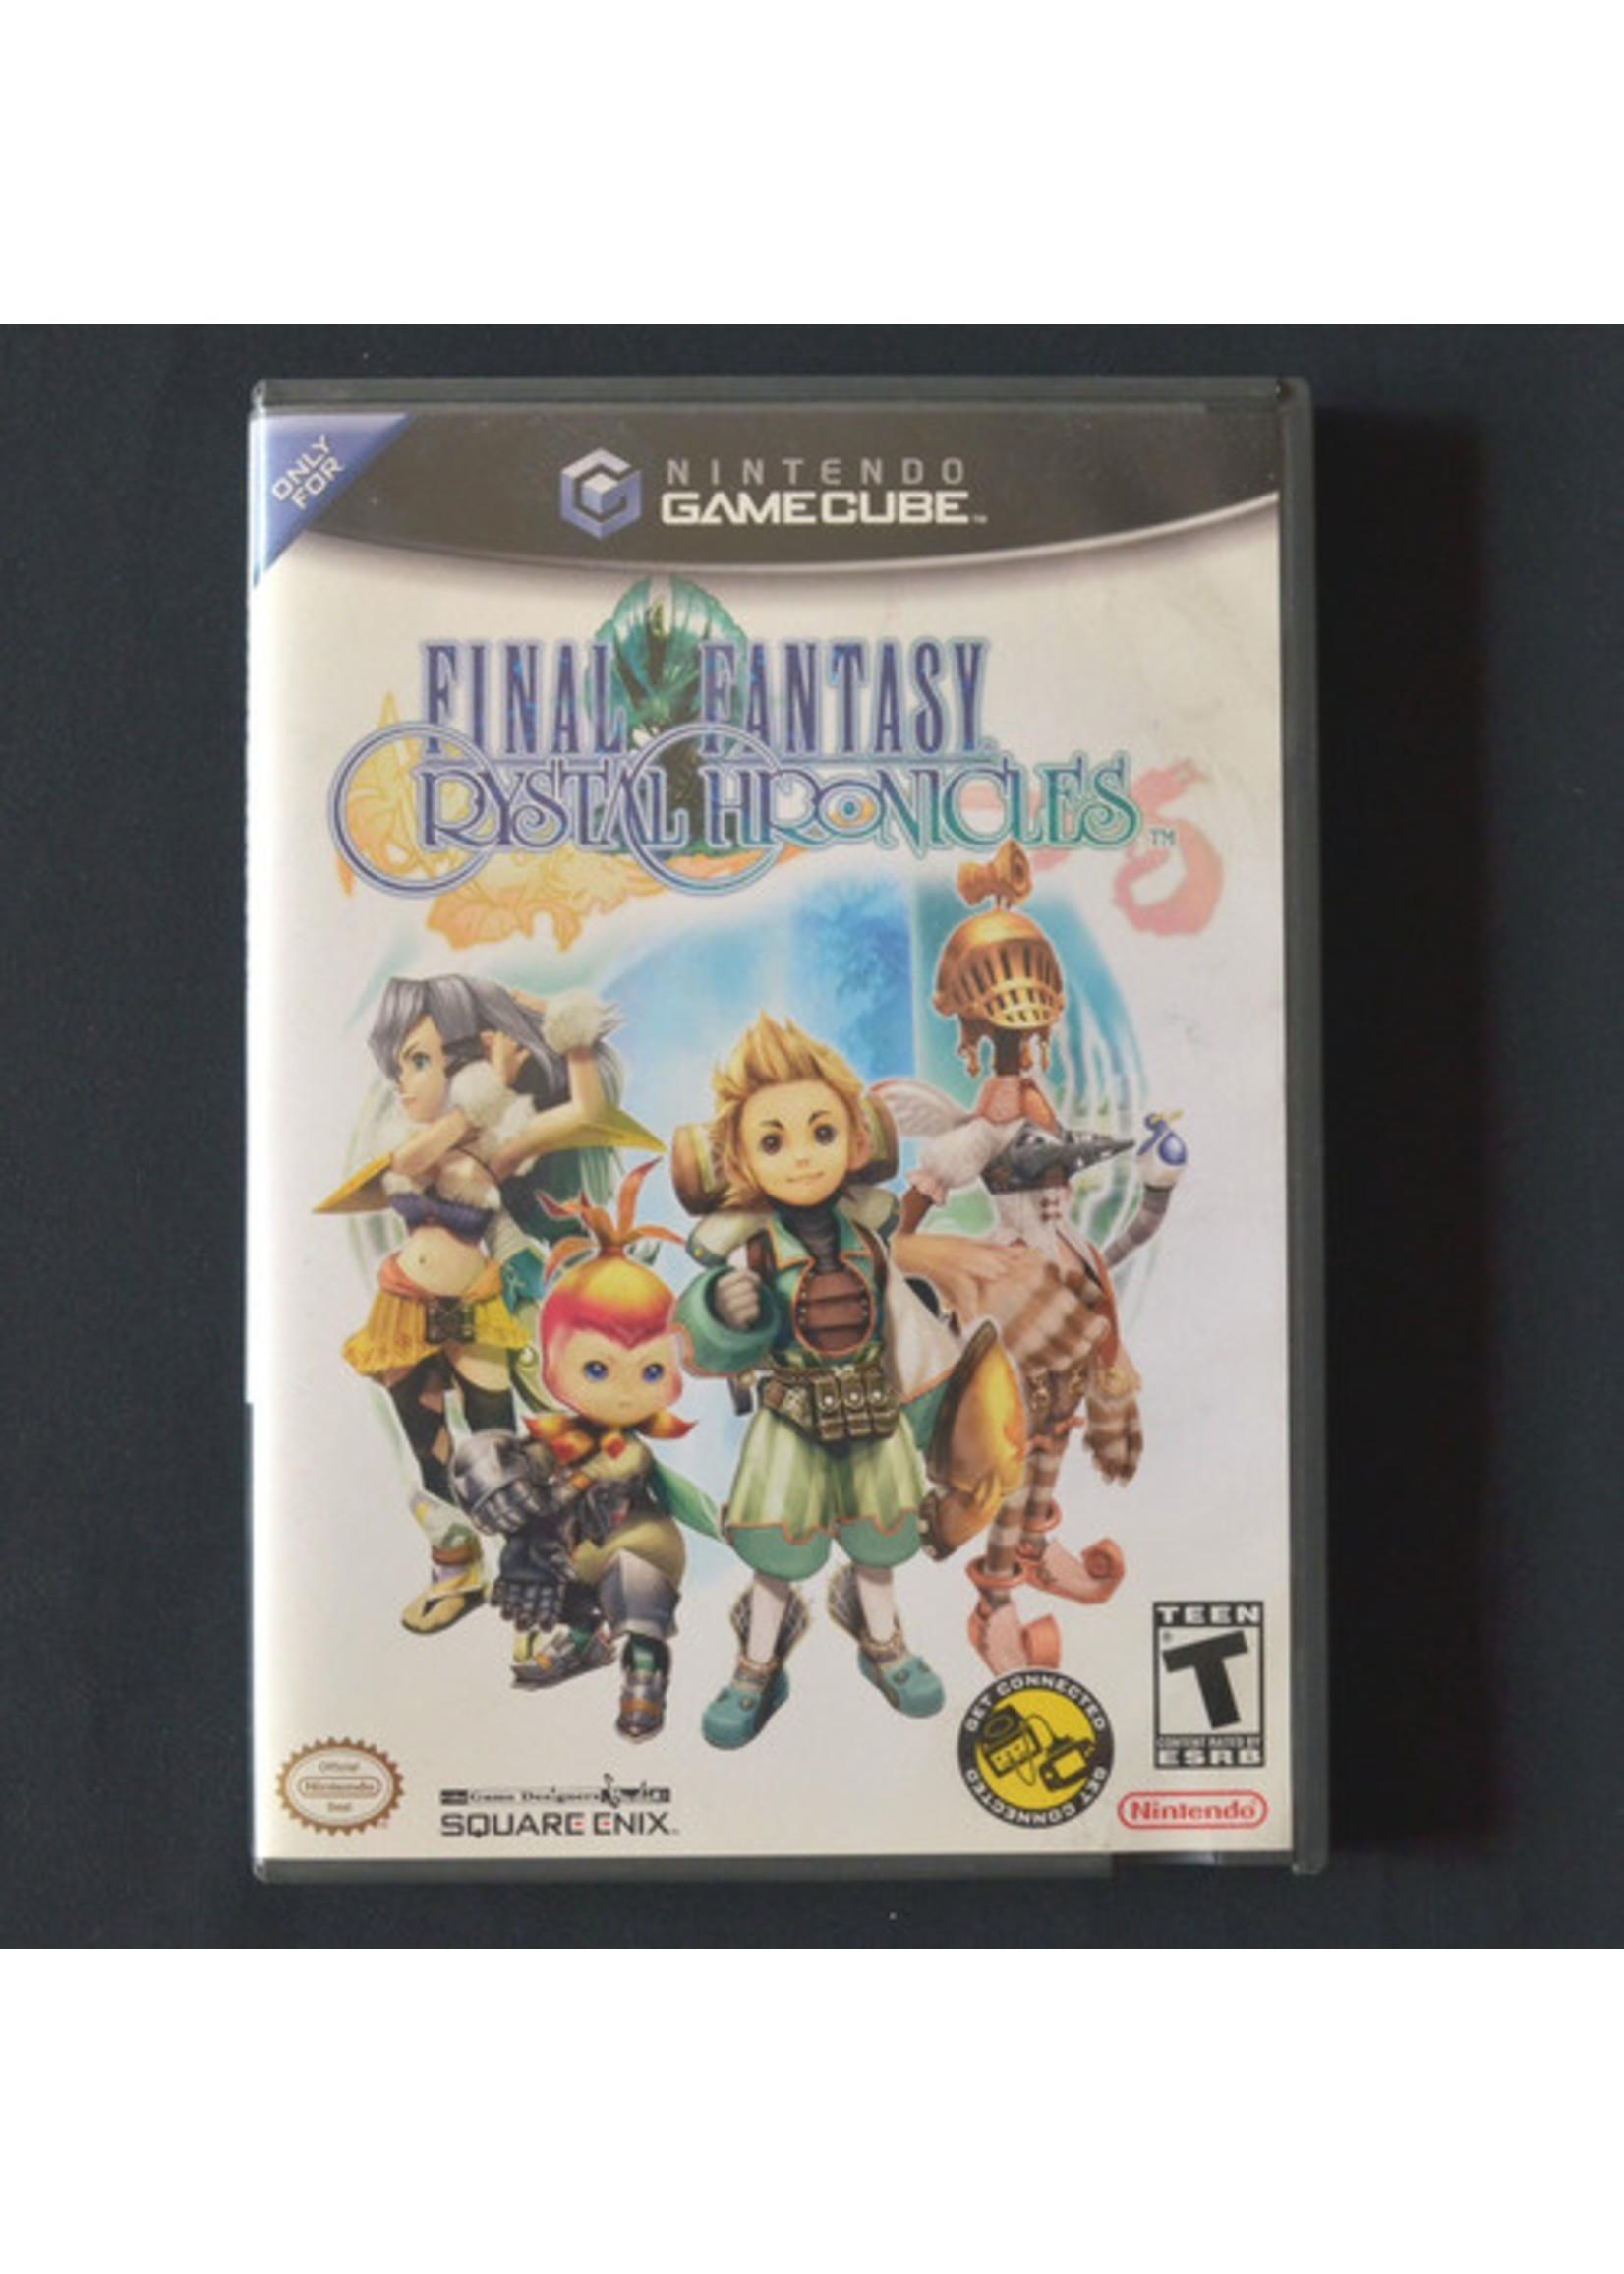 Final Fantasy Crystal Chronicles - NGC PrePlayed